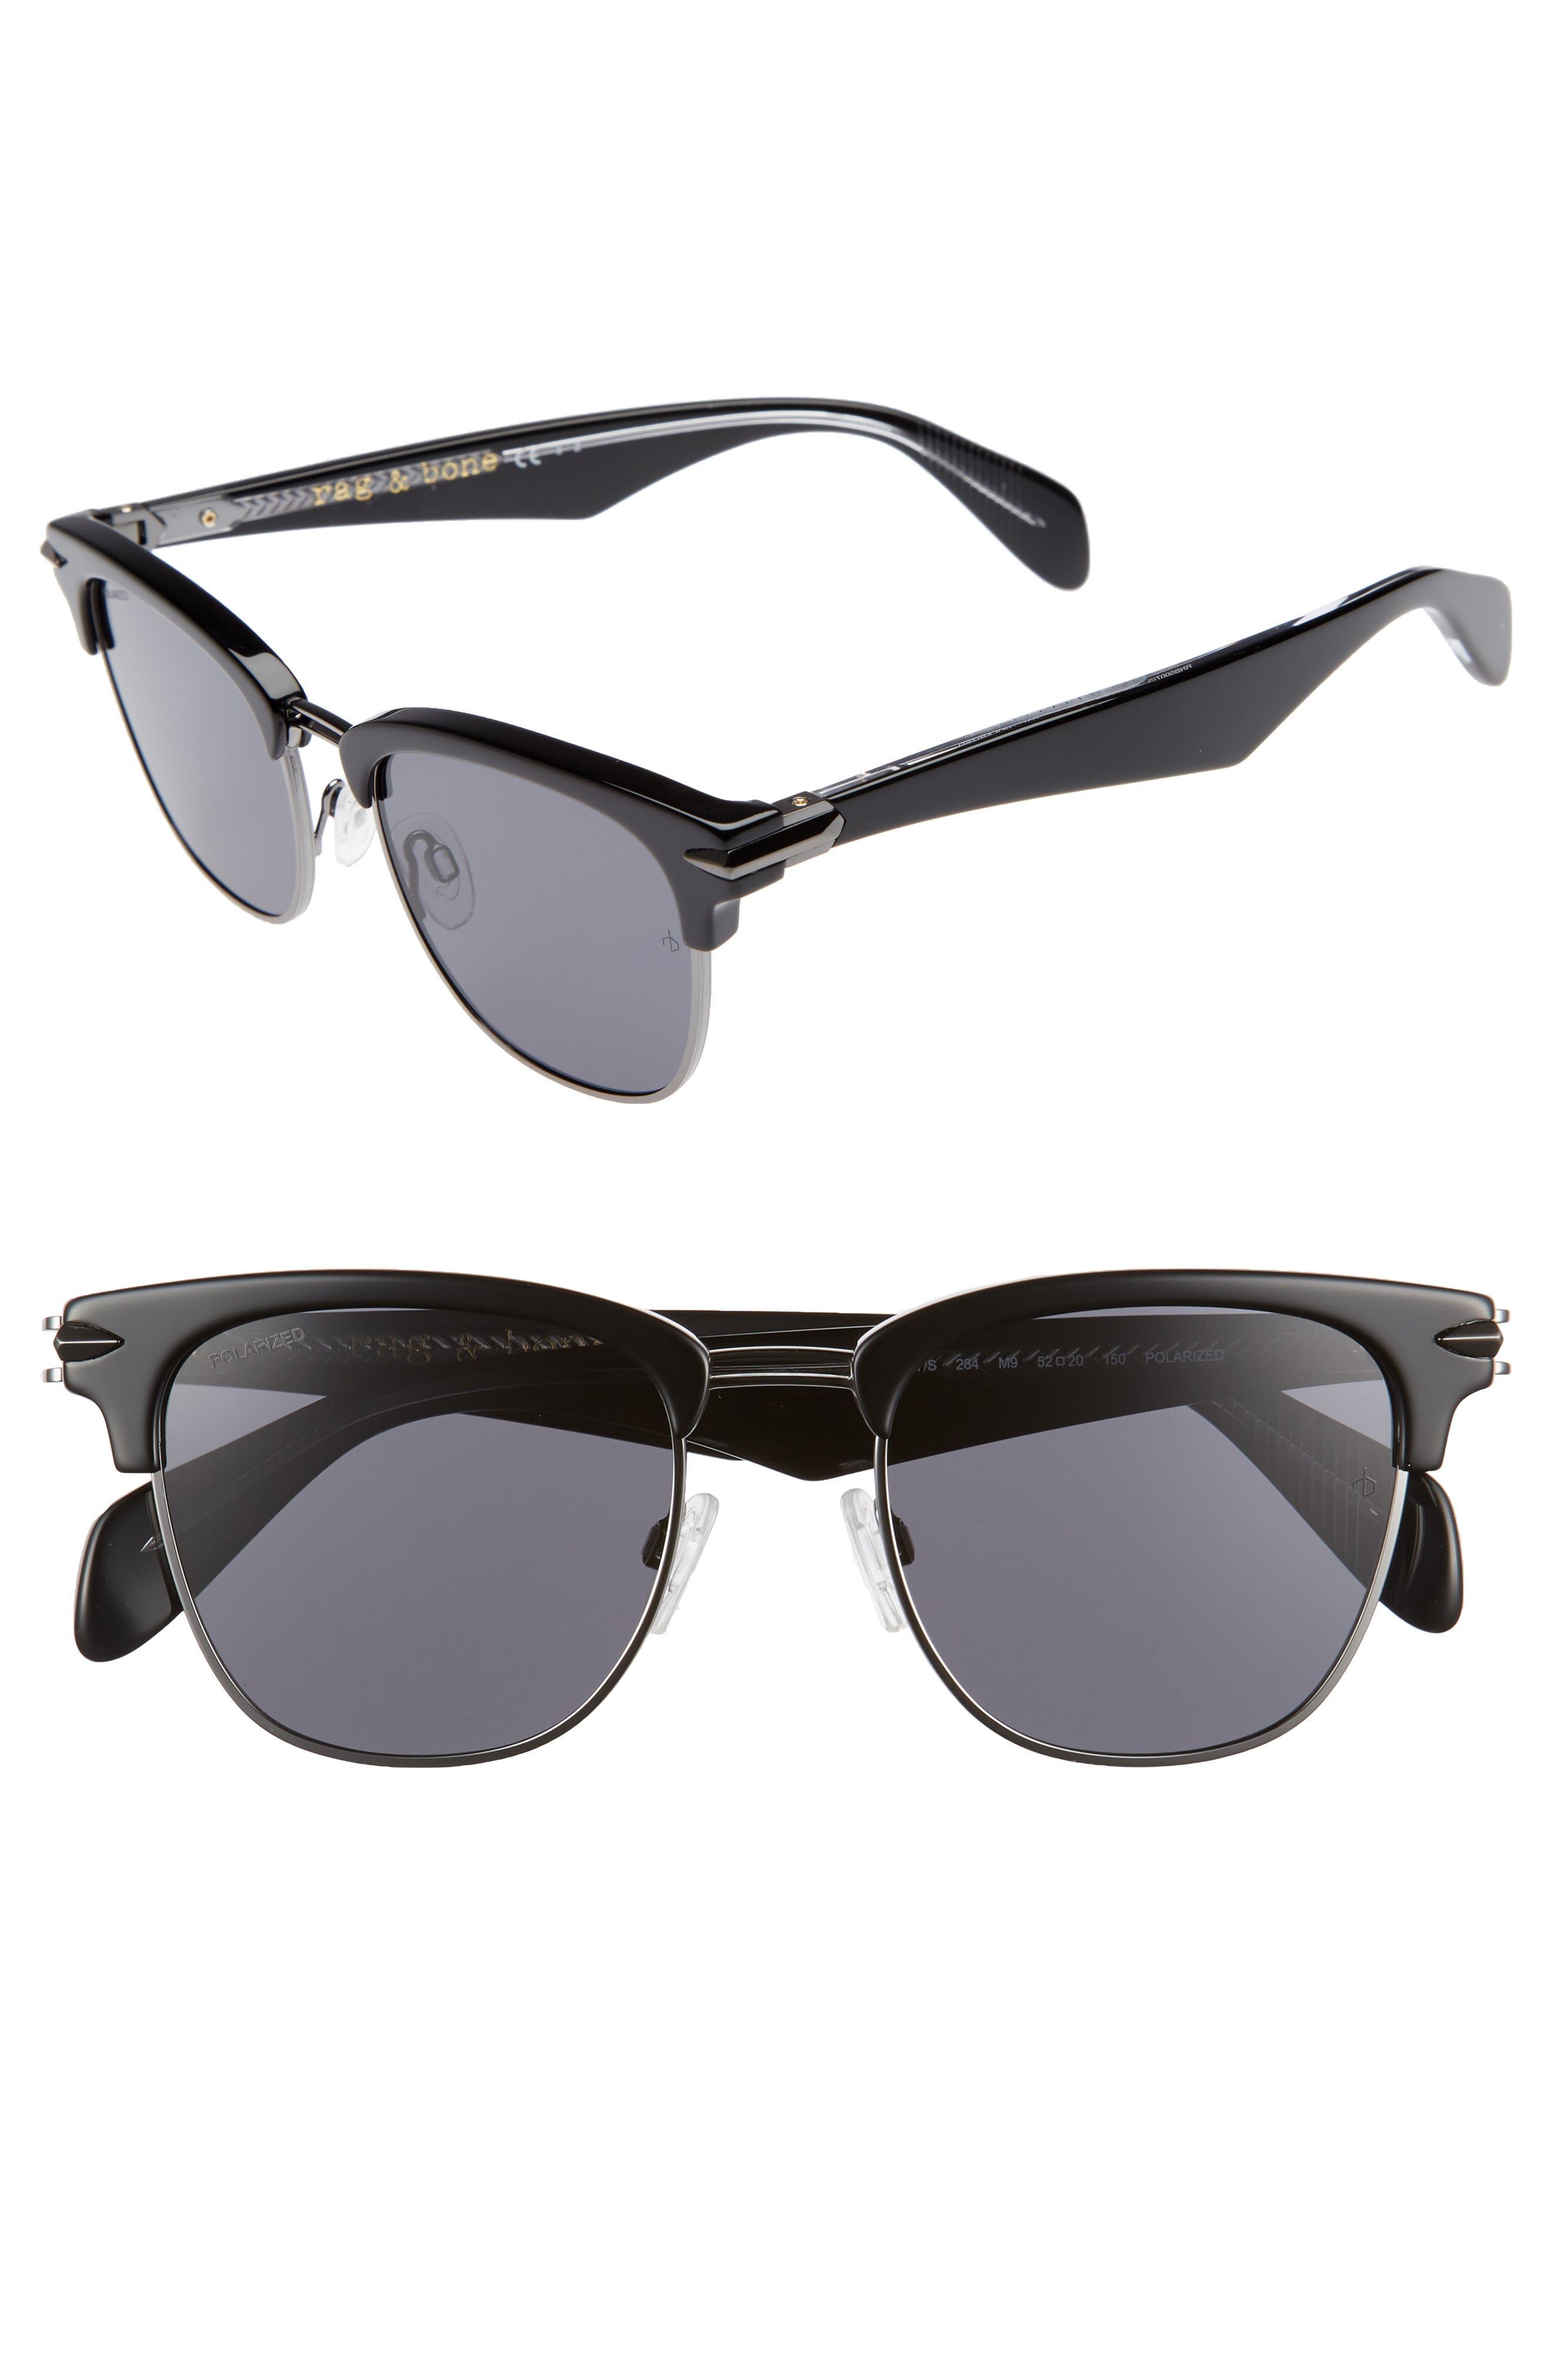 RAG & BONE,                             52mm Polarized Sunglasses,                             Main thumbnail 1, color,                             BLACK RUTH/ POLAR